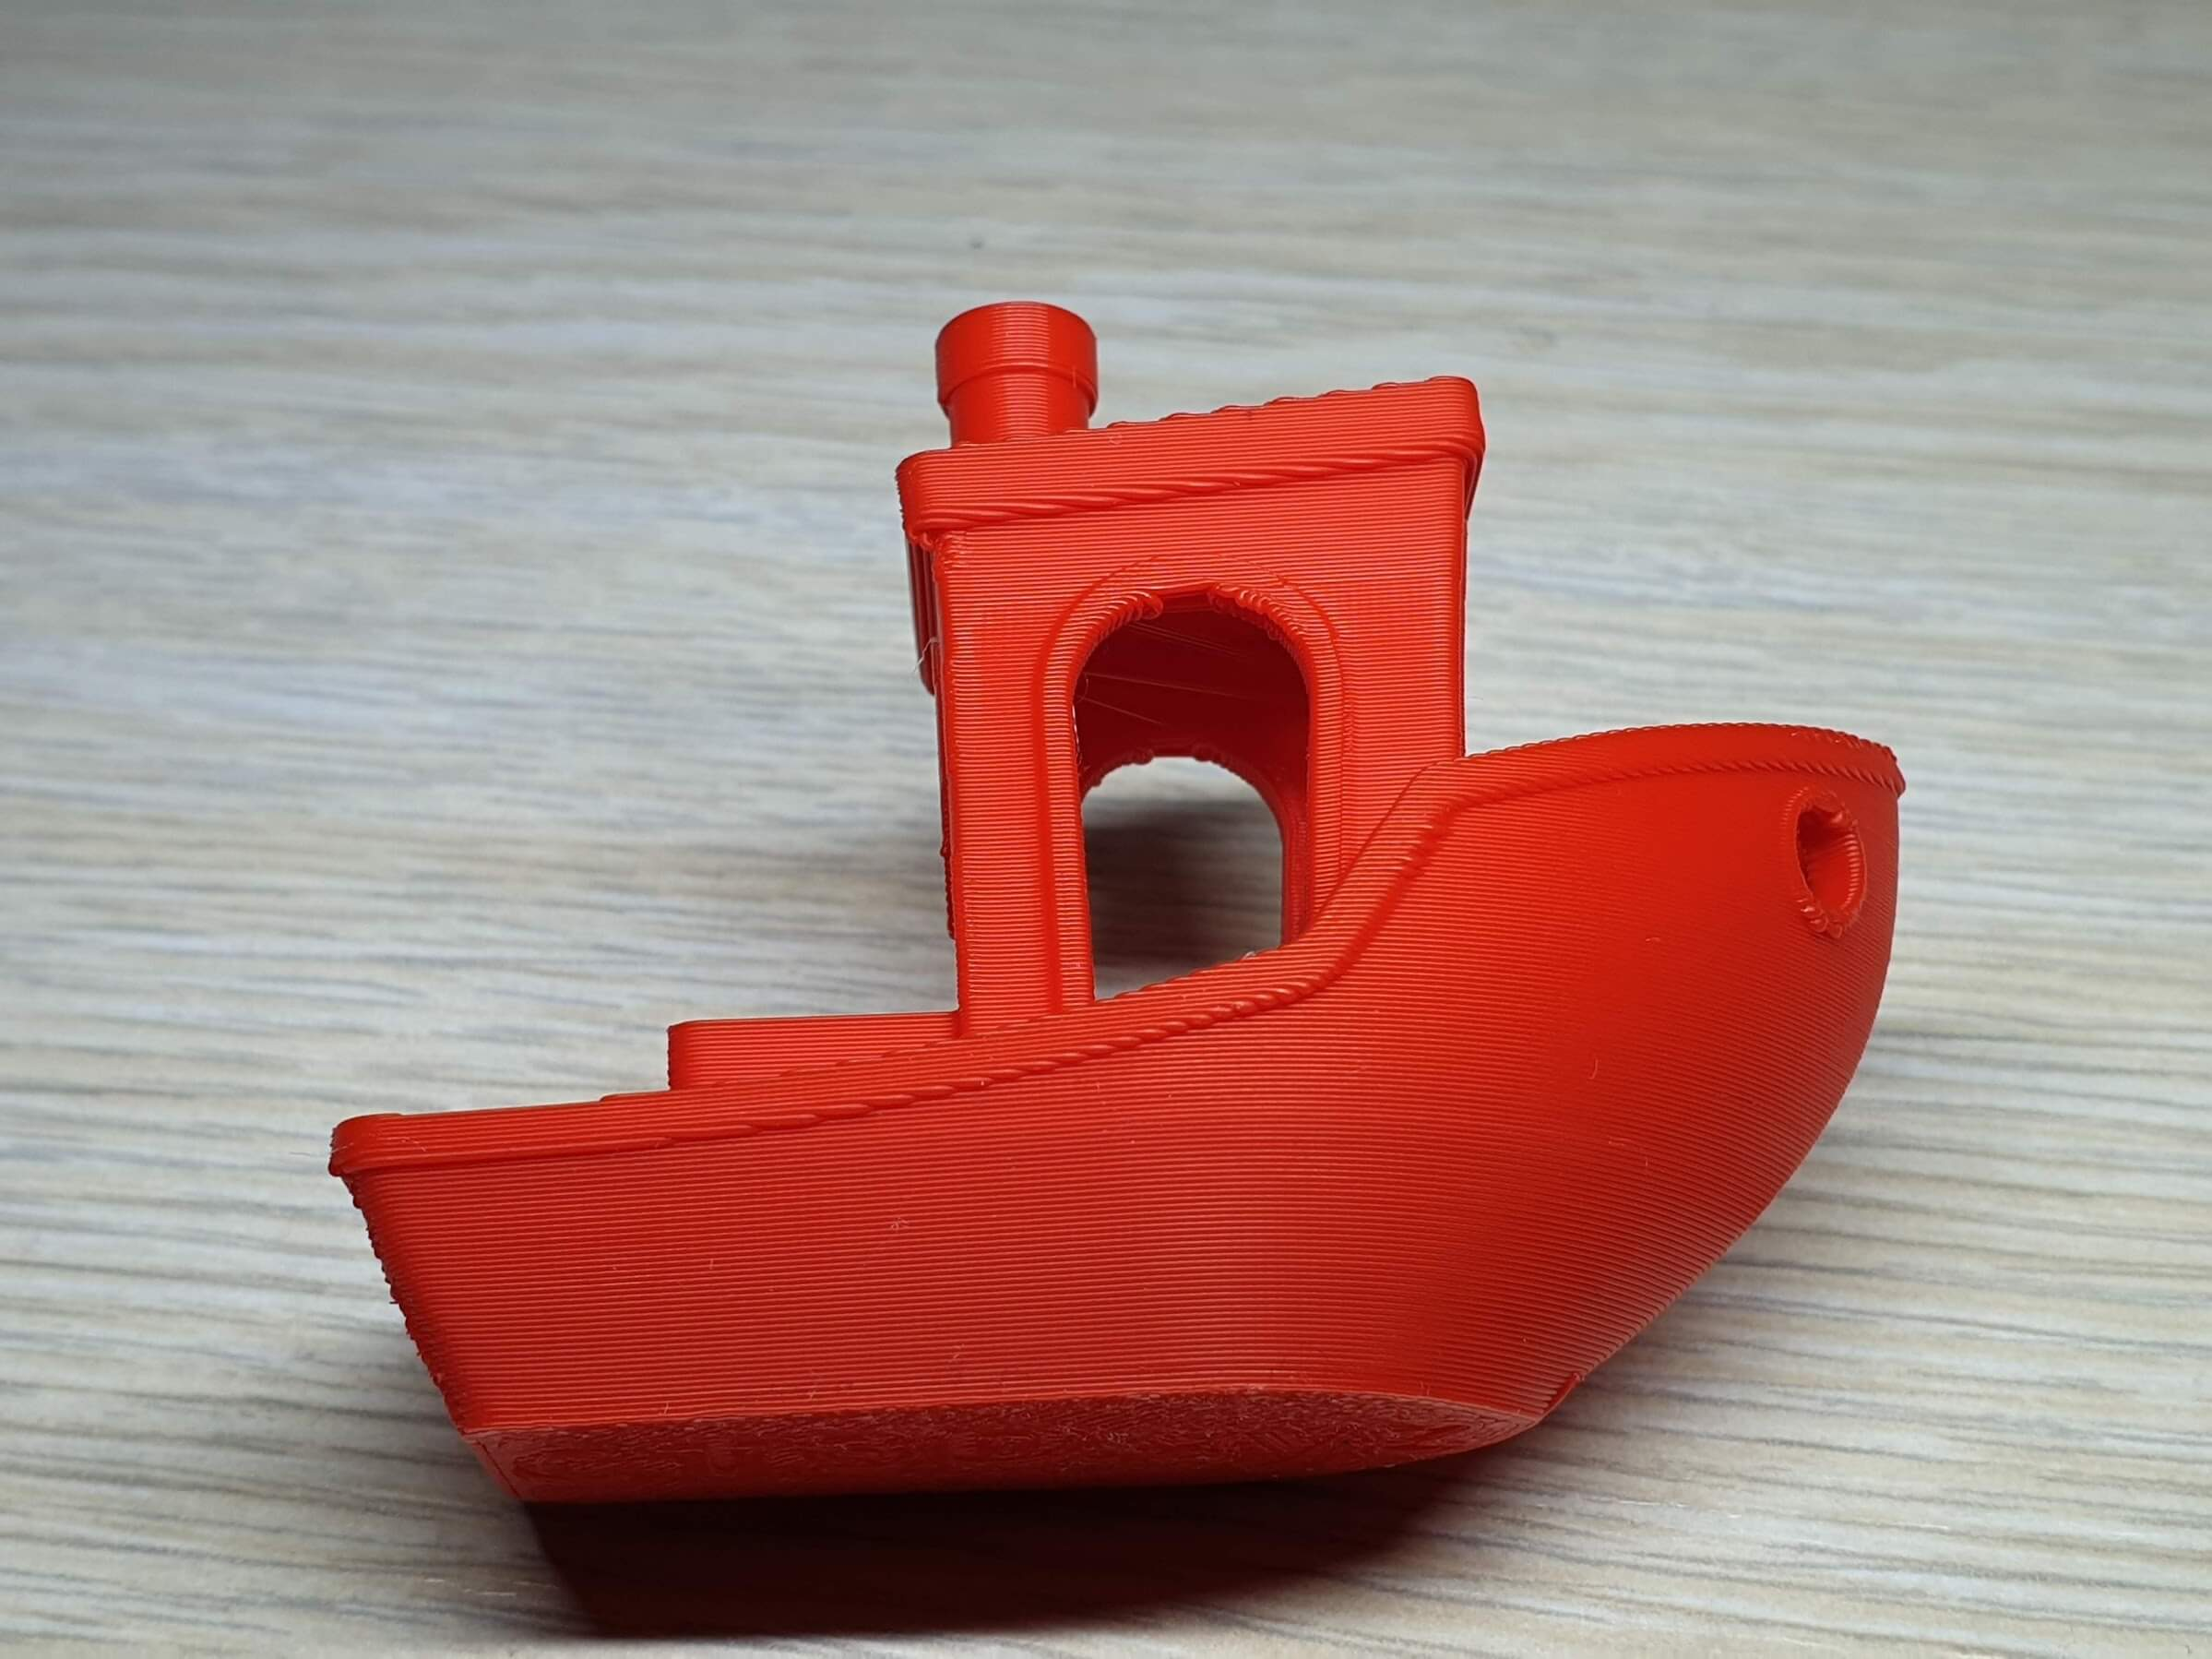 BIQU-B1-3D-Benchy-print-test-1